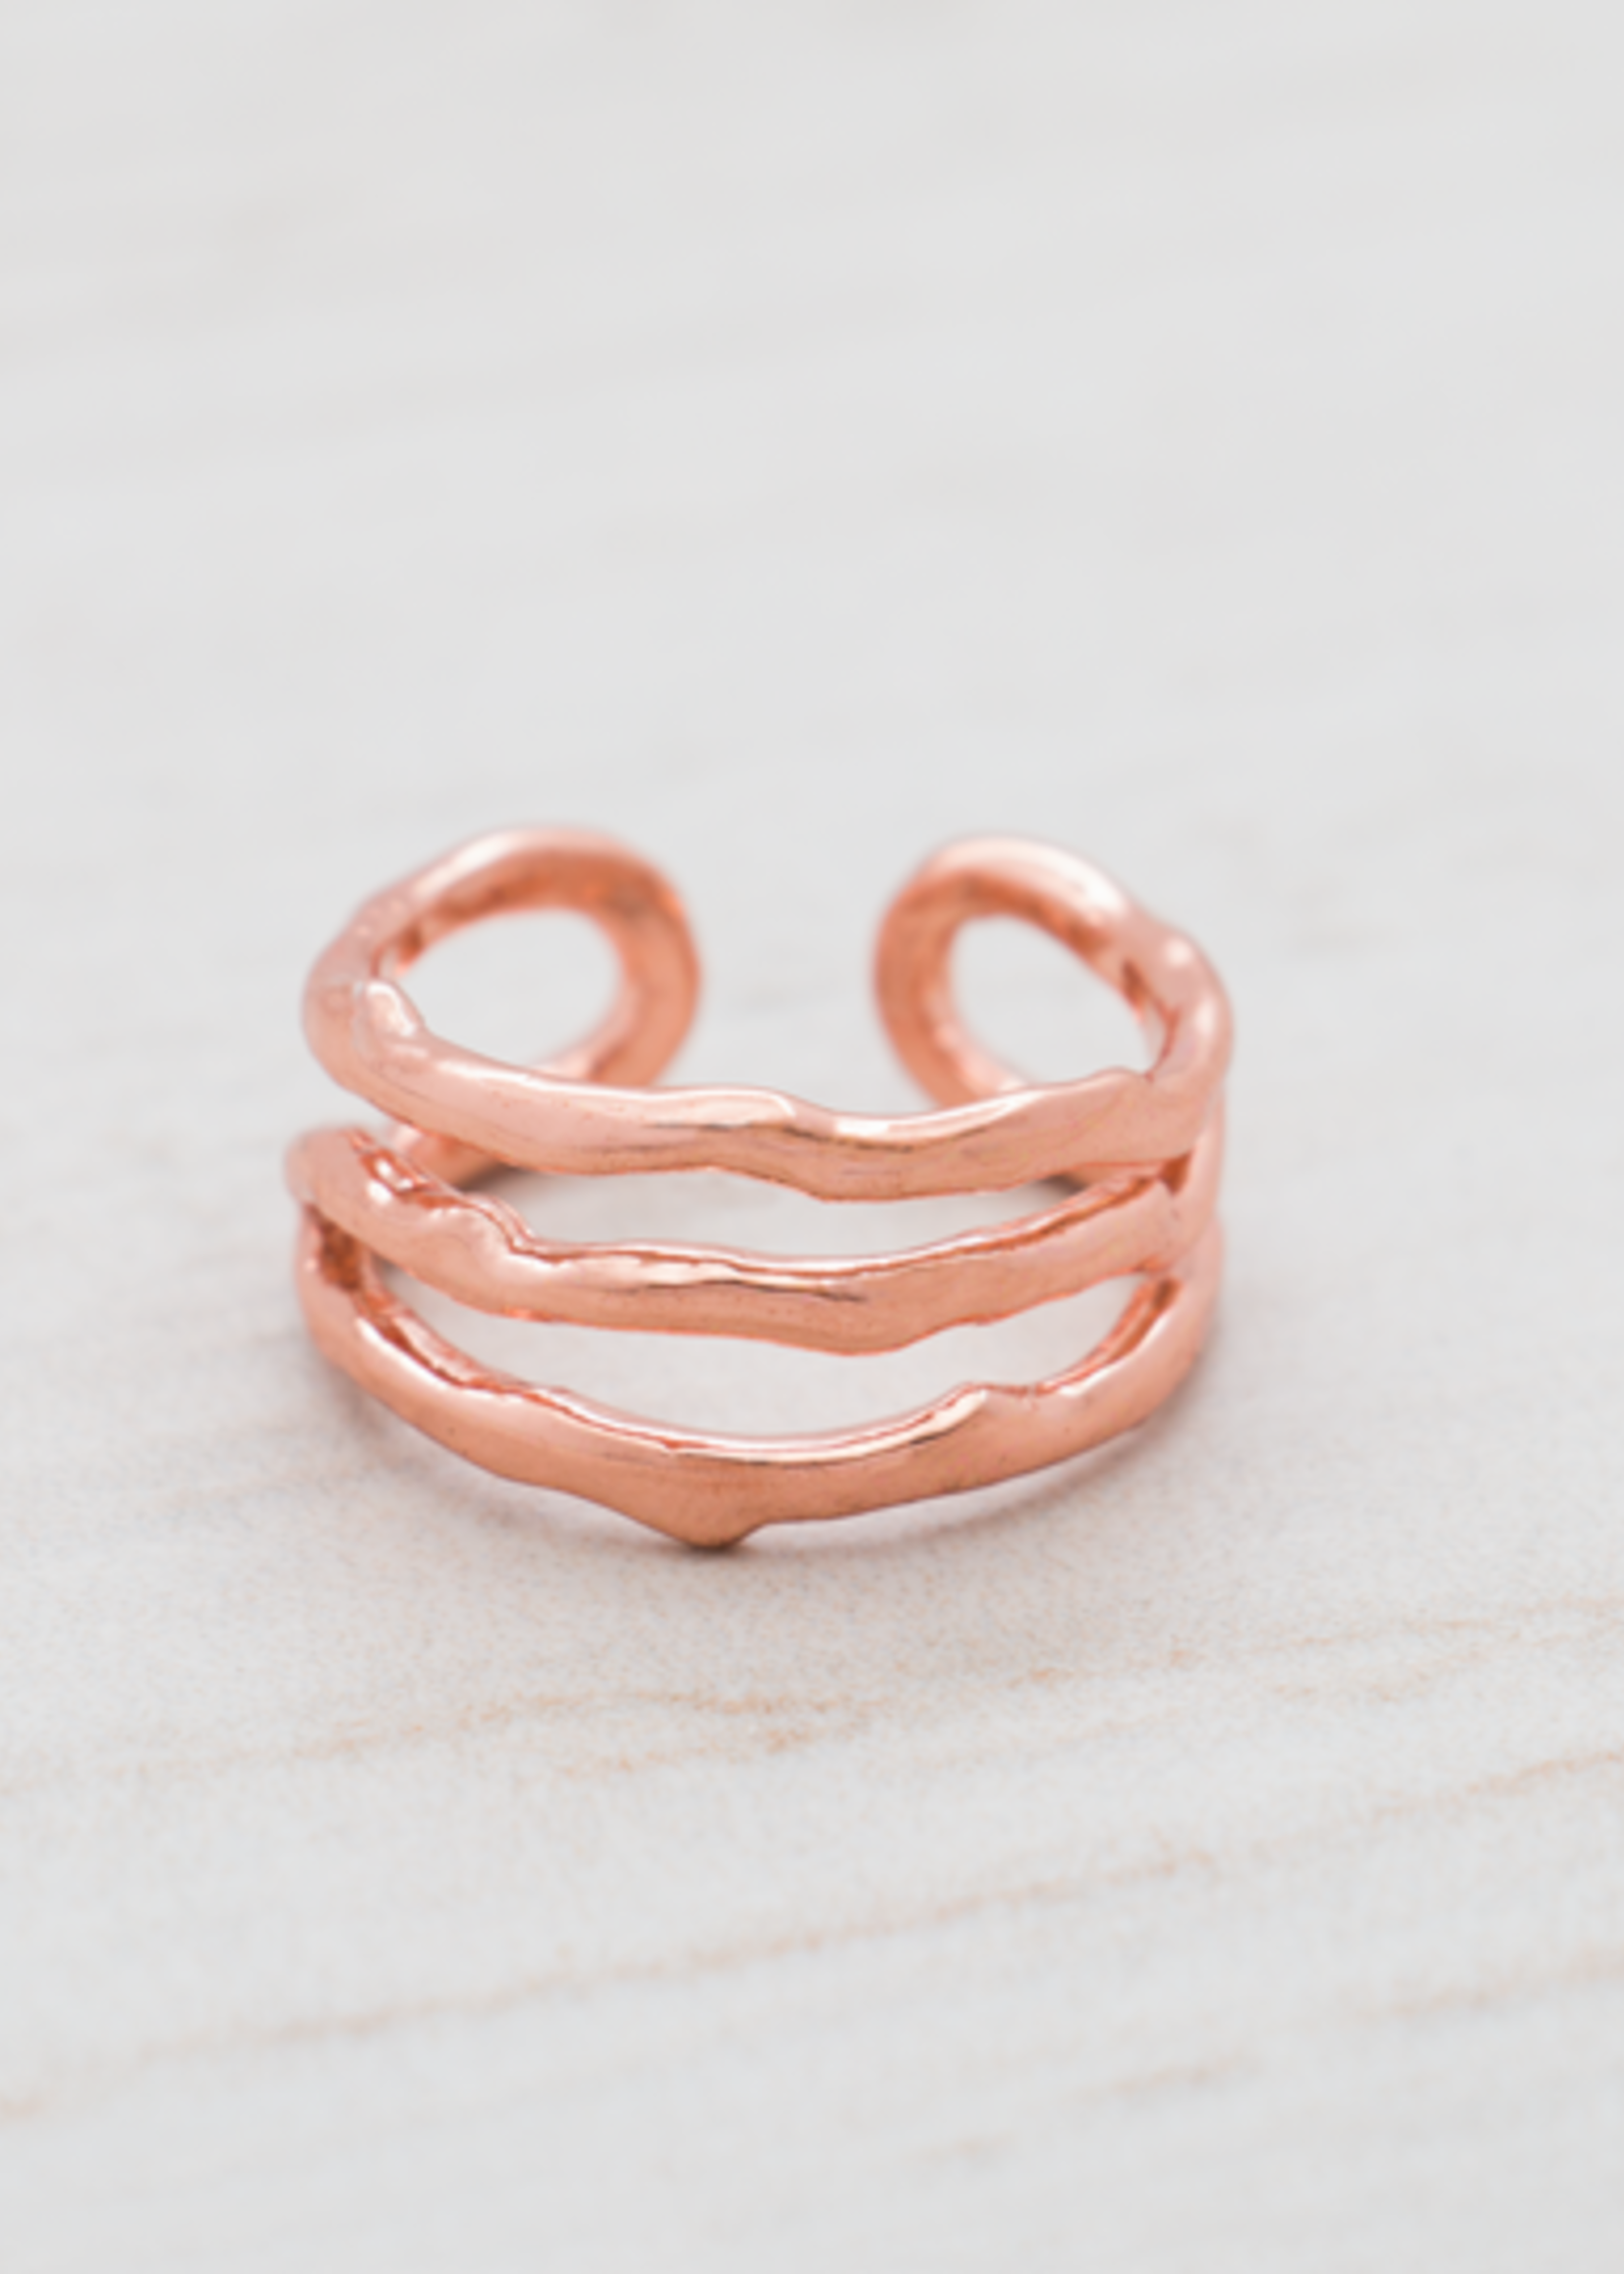 Glee Jewelry Sage ring rose gold